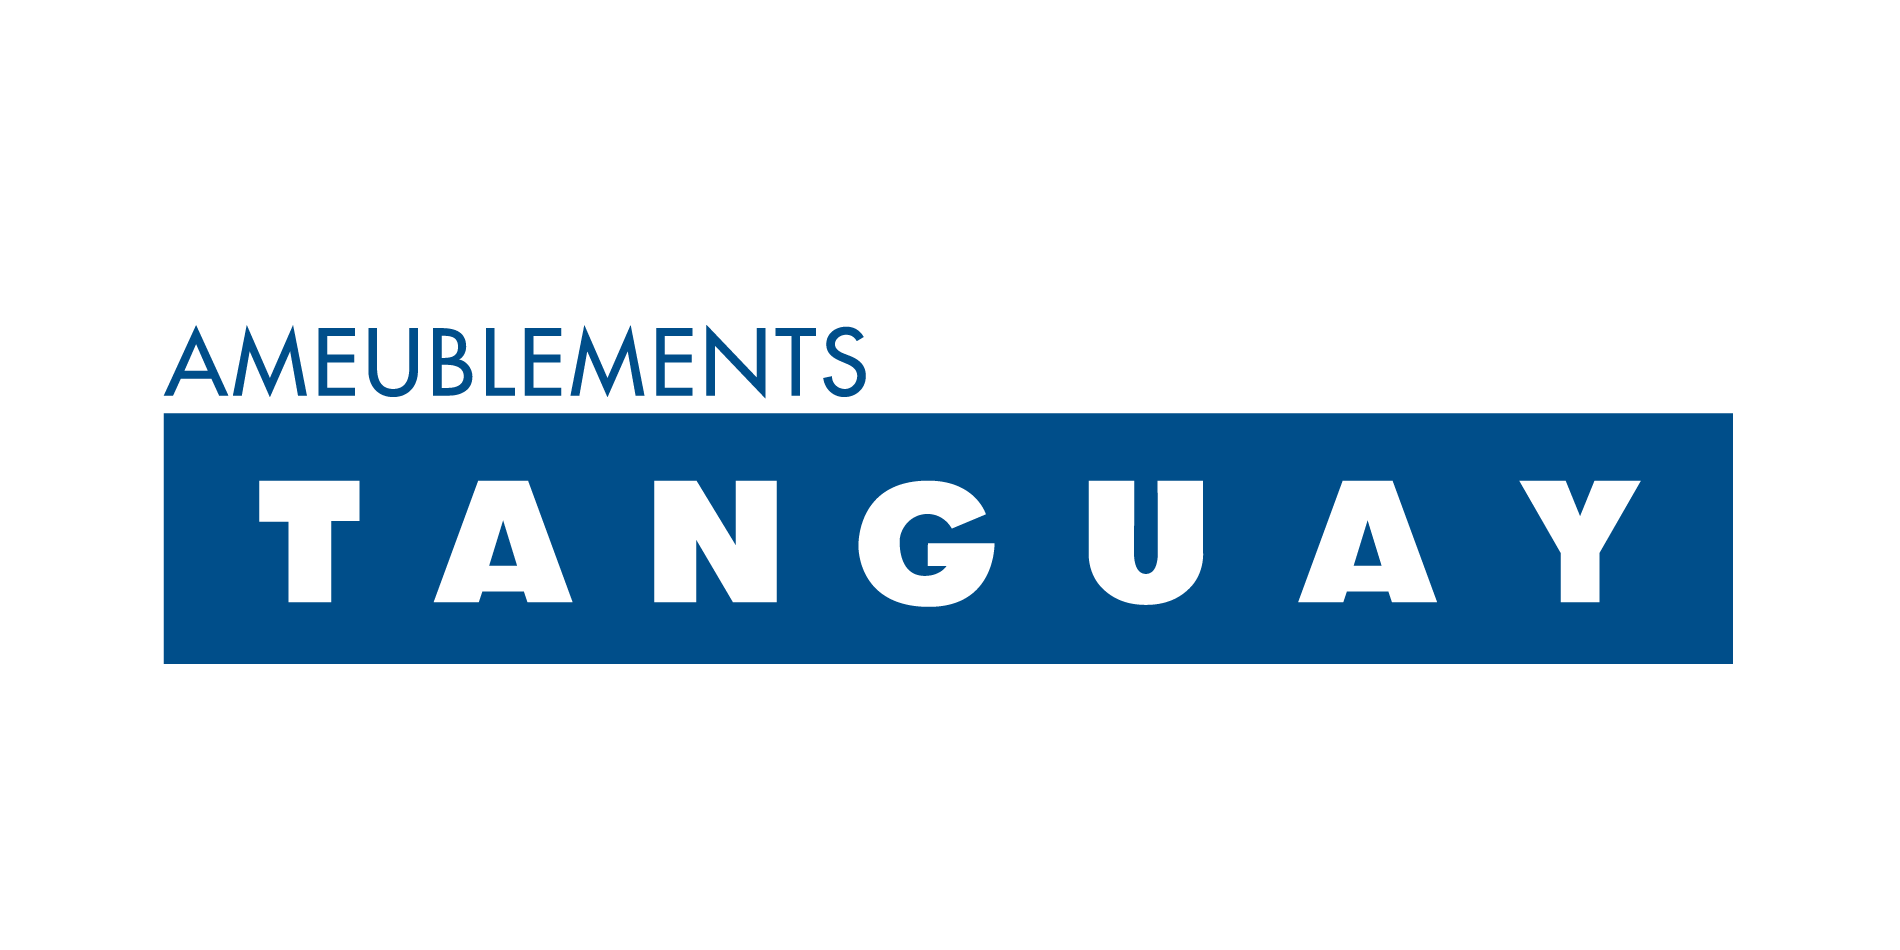 AMEUBLEMENTS TANGUAY